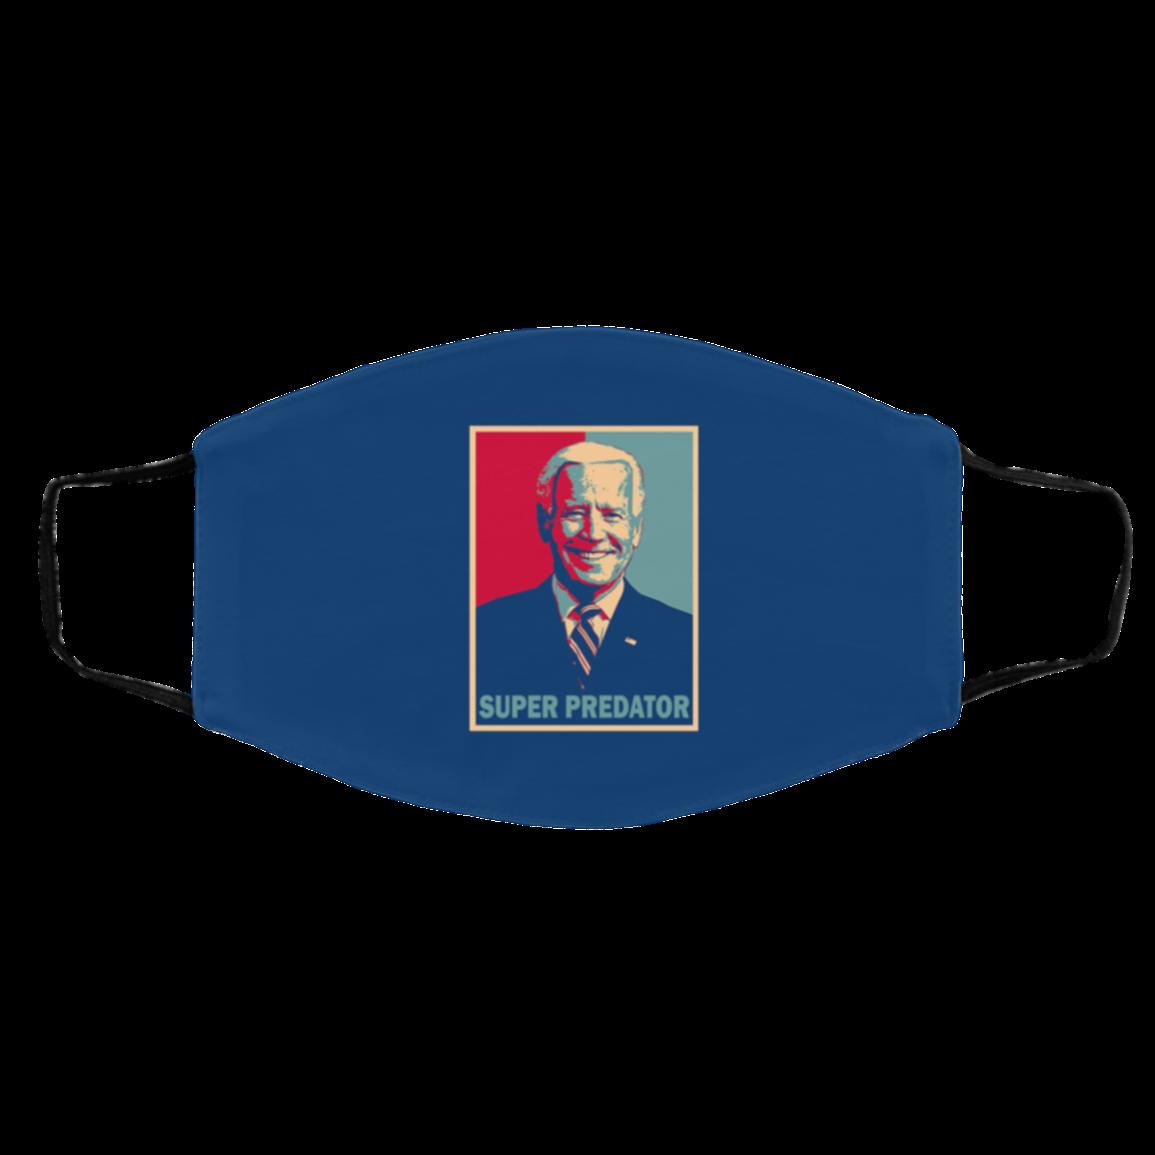 Black Americans Super-Predator Dumb Joe Biden Washable Reusable Custom - Printed Cloth Face Mask Cover), White, Cloth Face Cover – Medium/Large